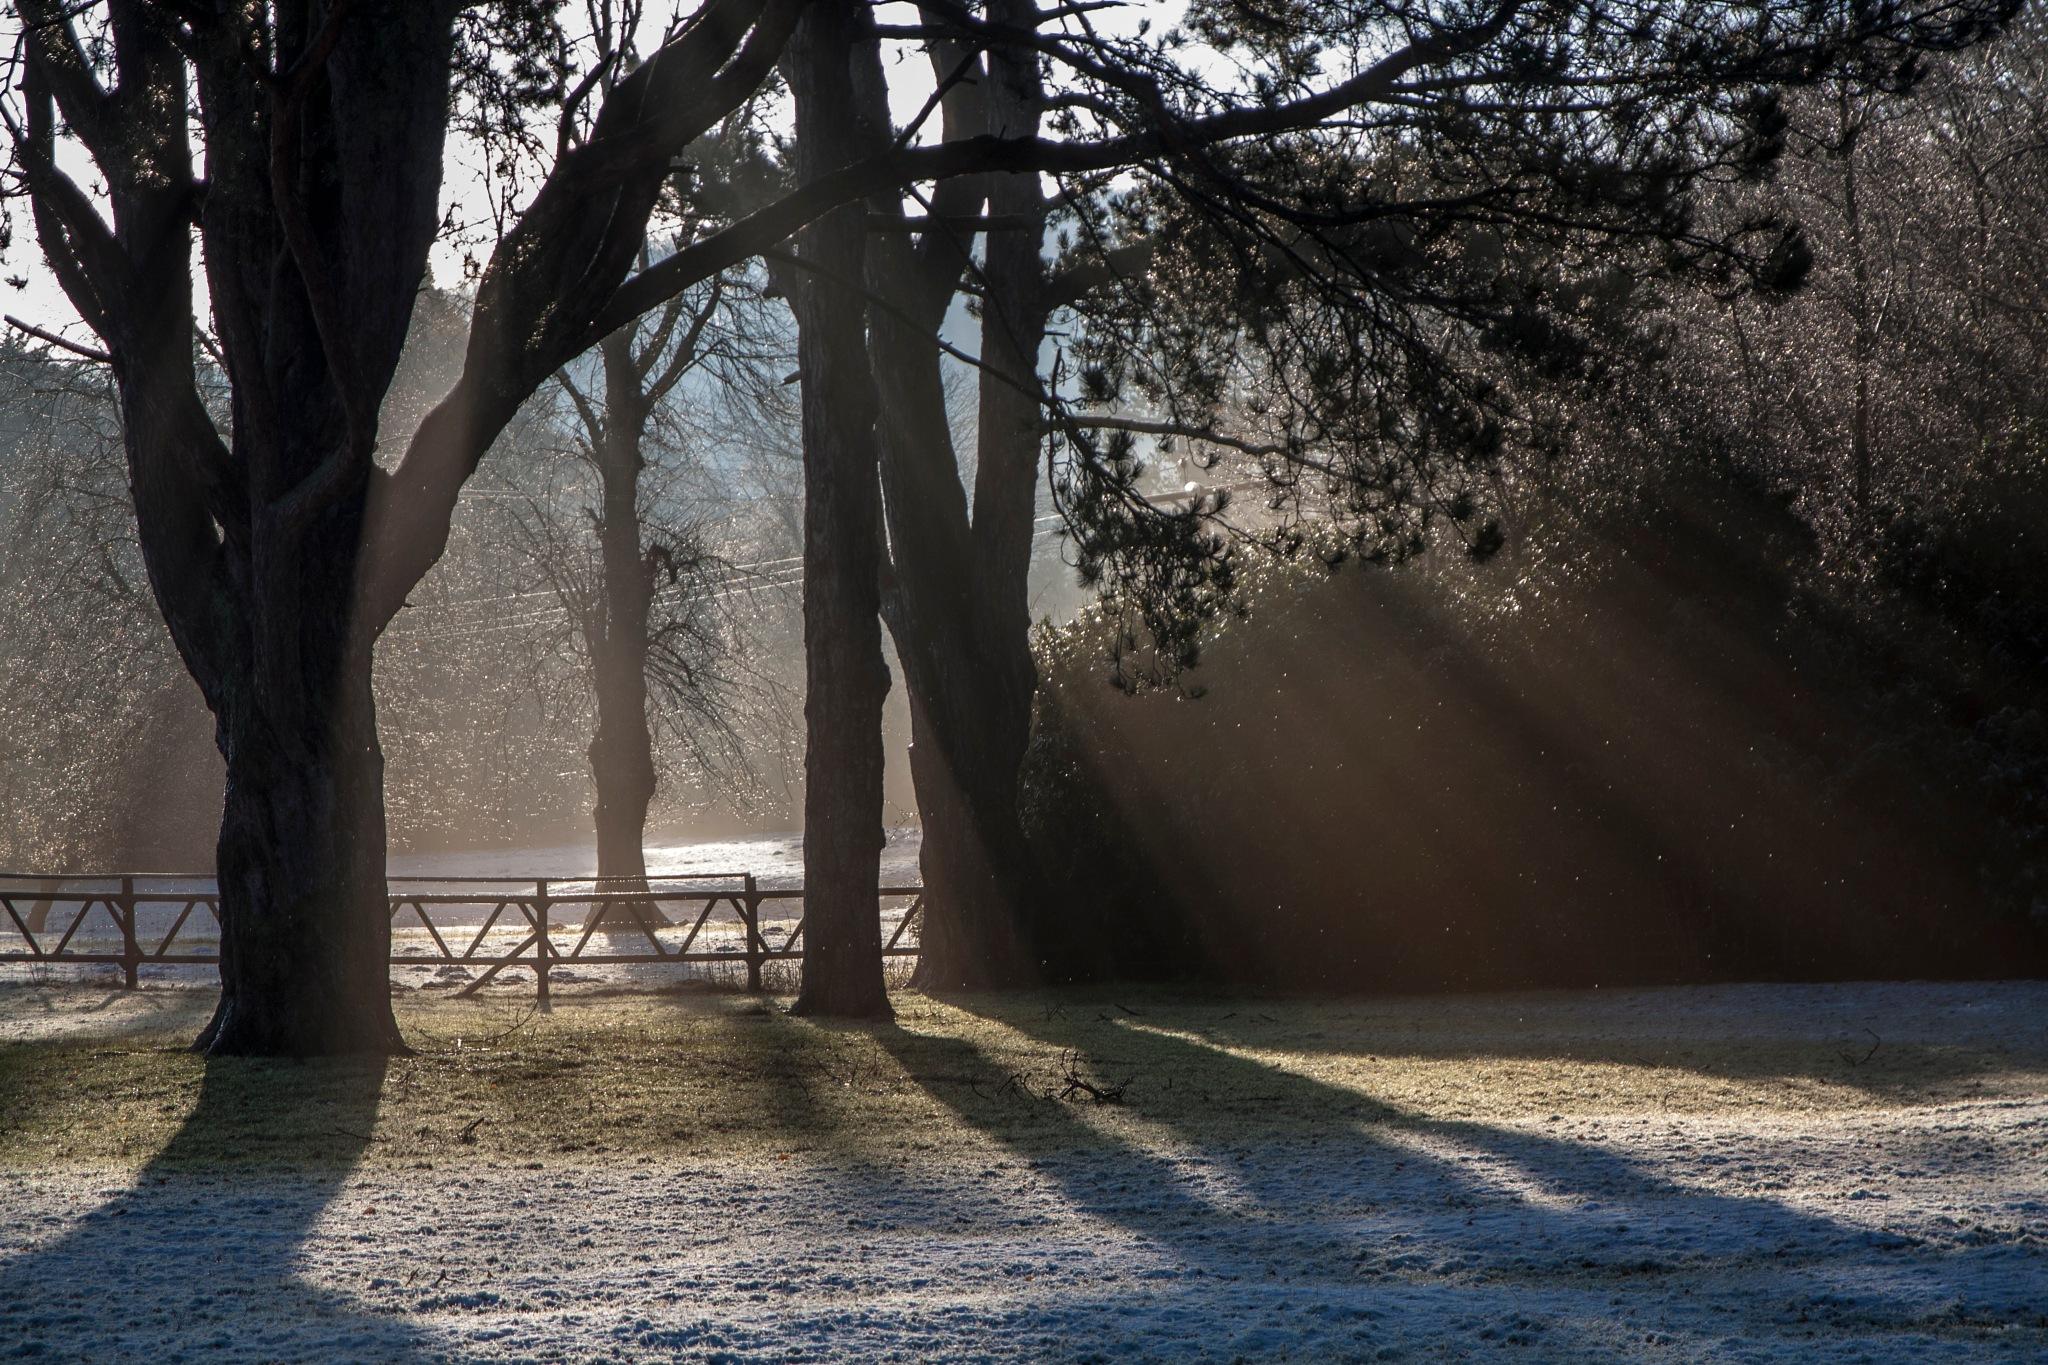 Sunbeams through trees onto Frosty Ground by martin.davis.5243817